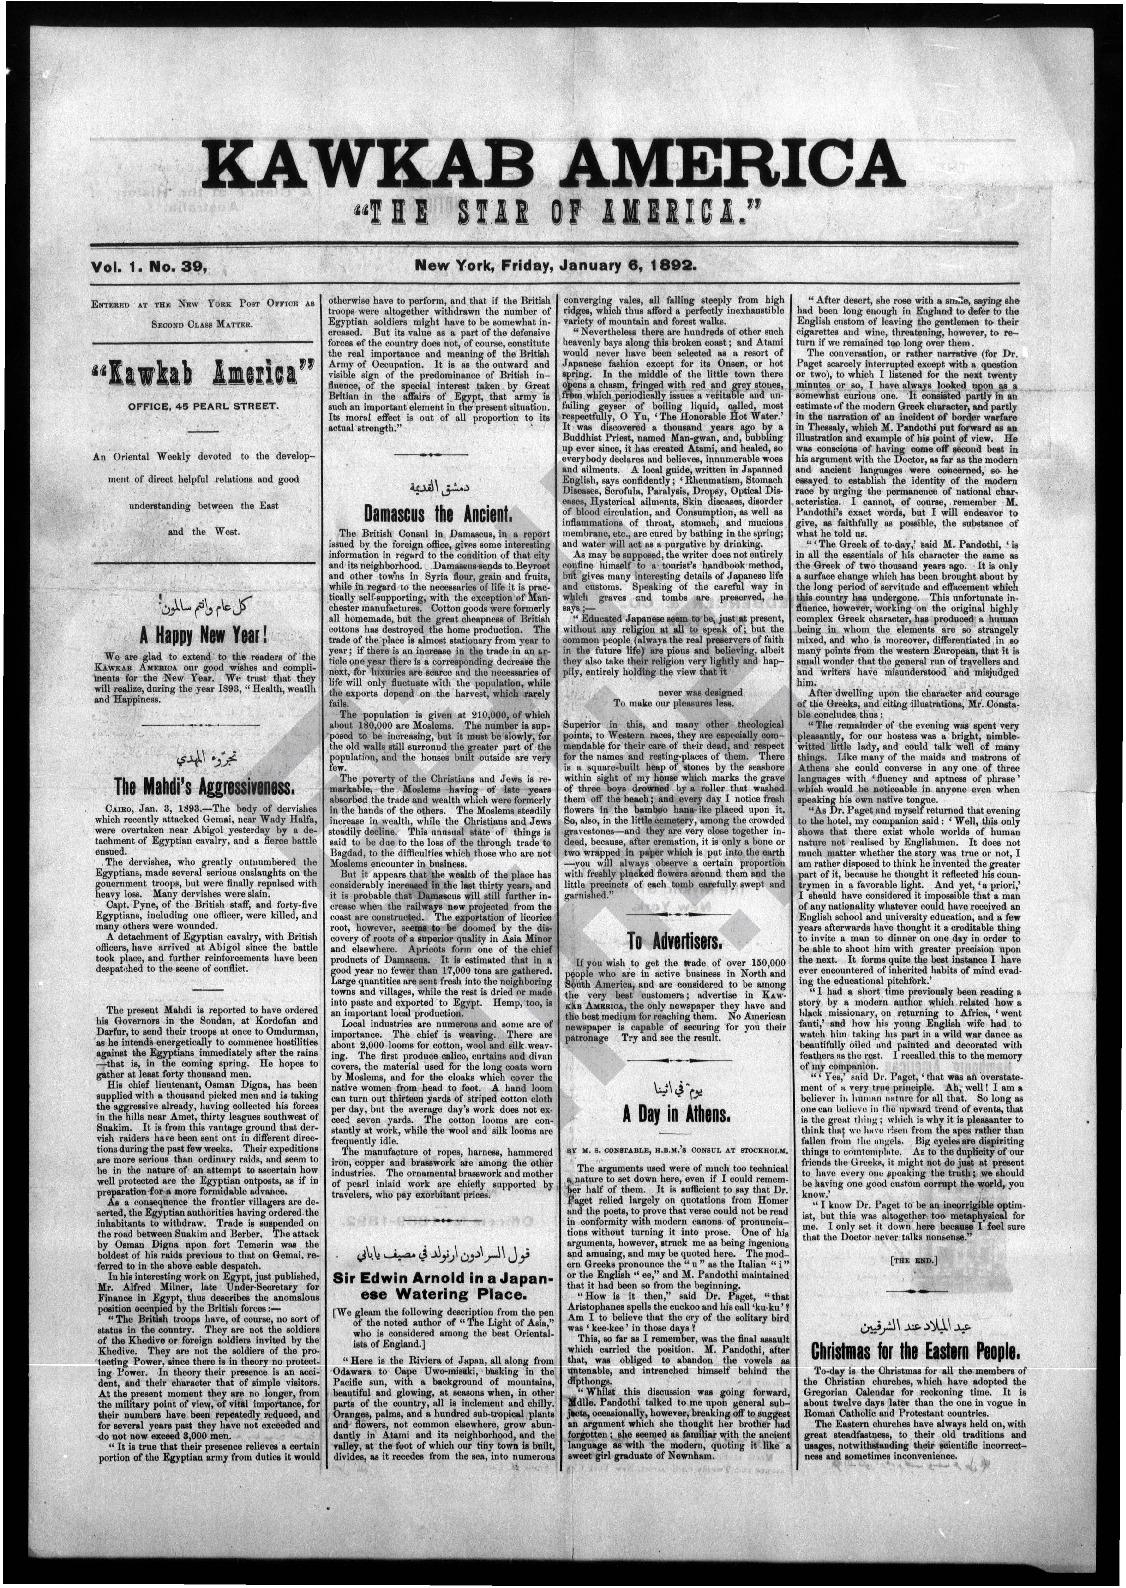 kawkab amirka_vol 1 no 39_jan 6 1893_wmc.pdf